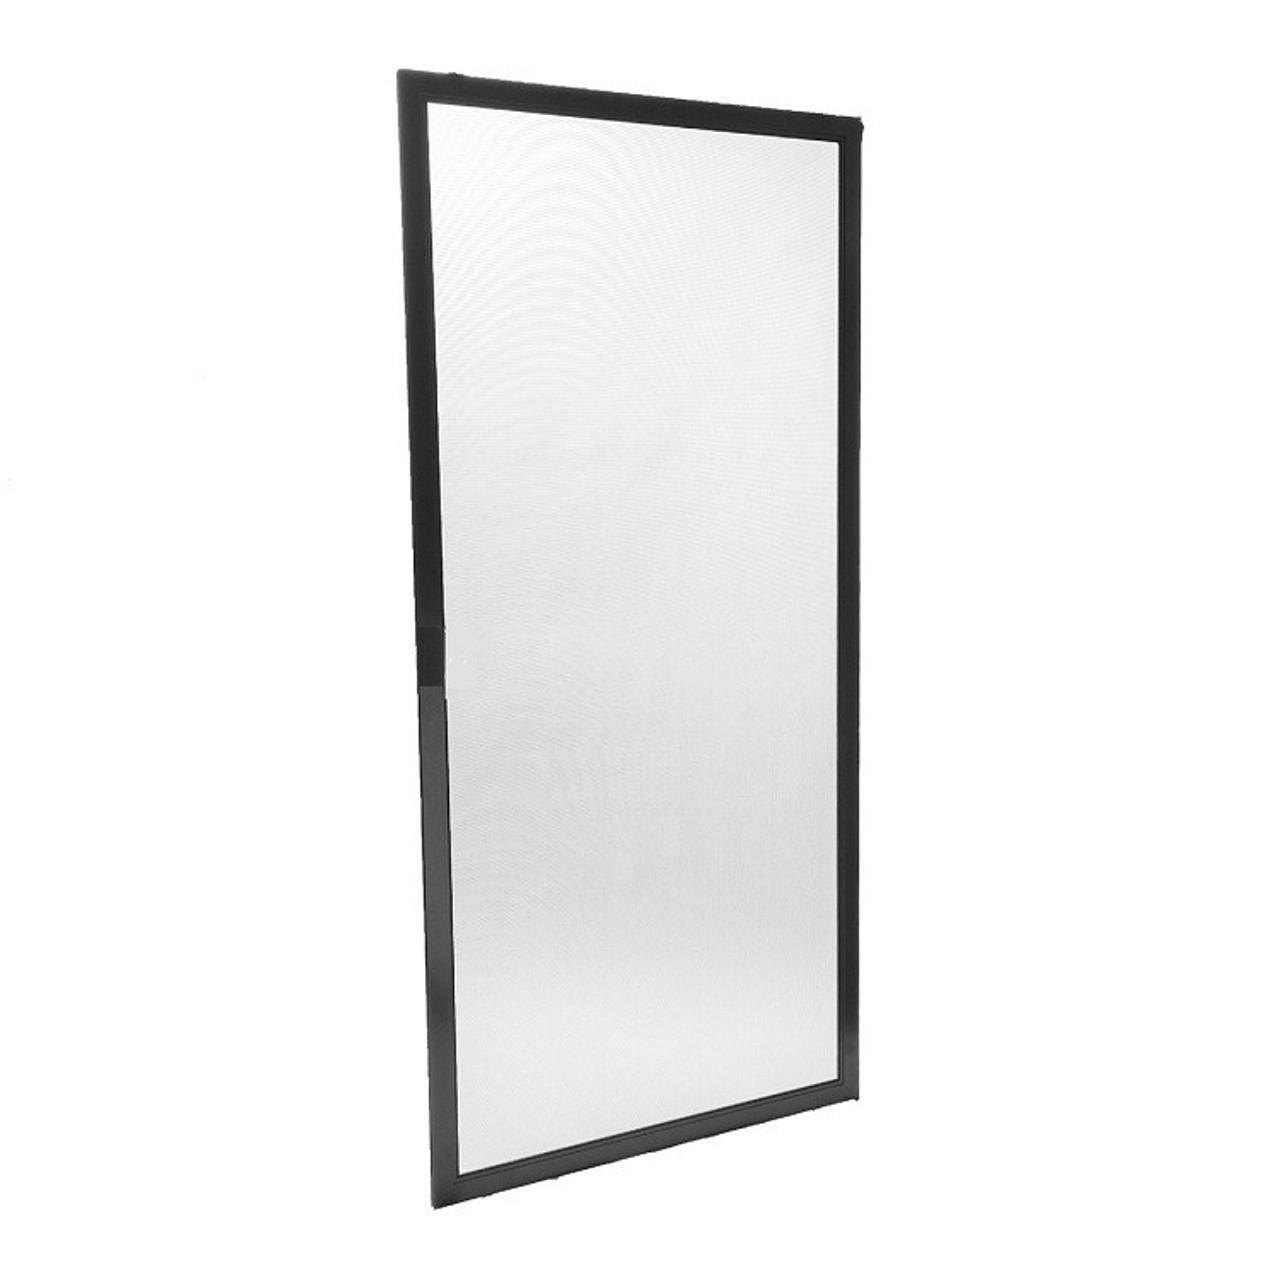 Porch Screen Panels With Charcoal Fiberglass Mesh